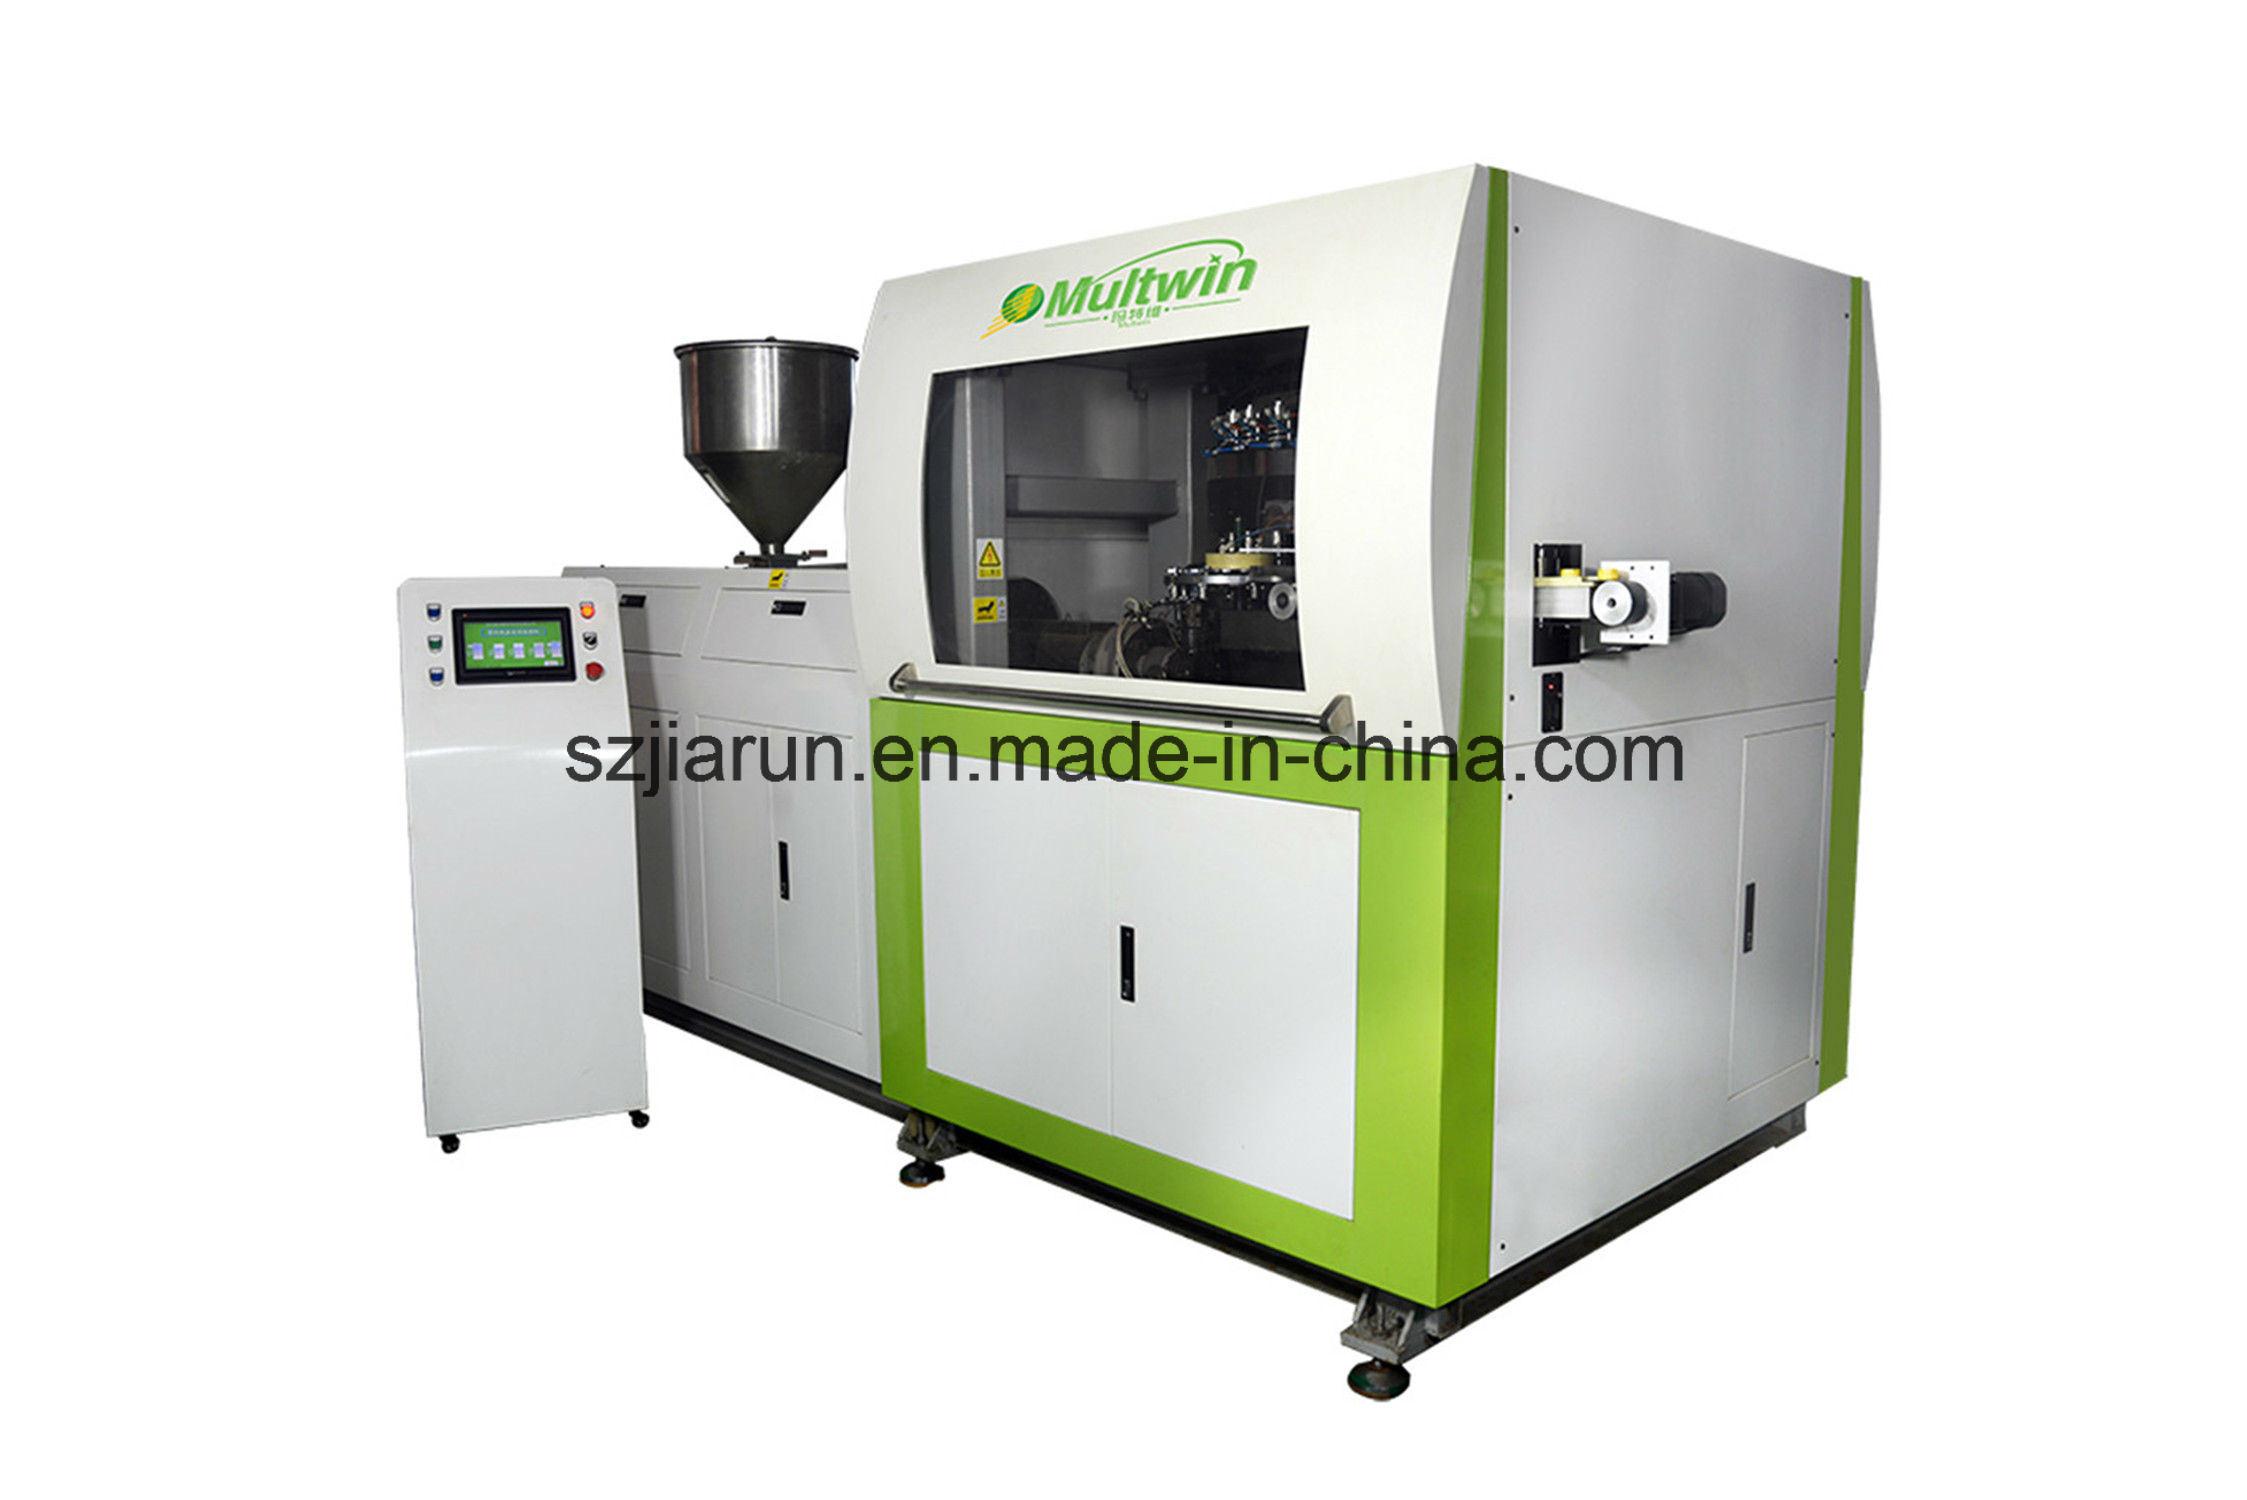 Automatic Plastic Compression Cap Making/Molding Machine for Threaded Caps